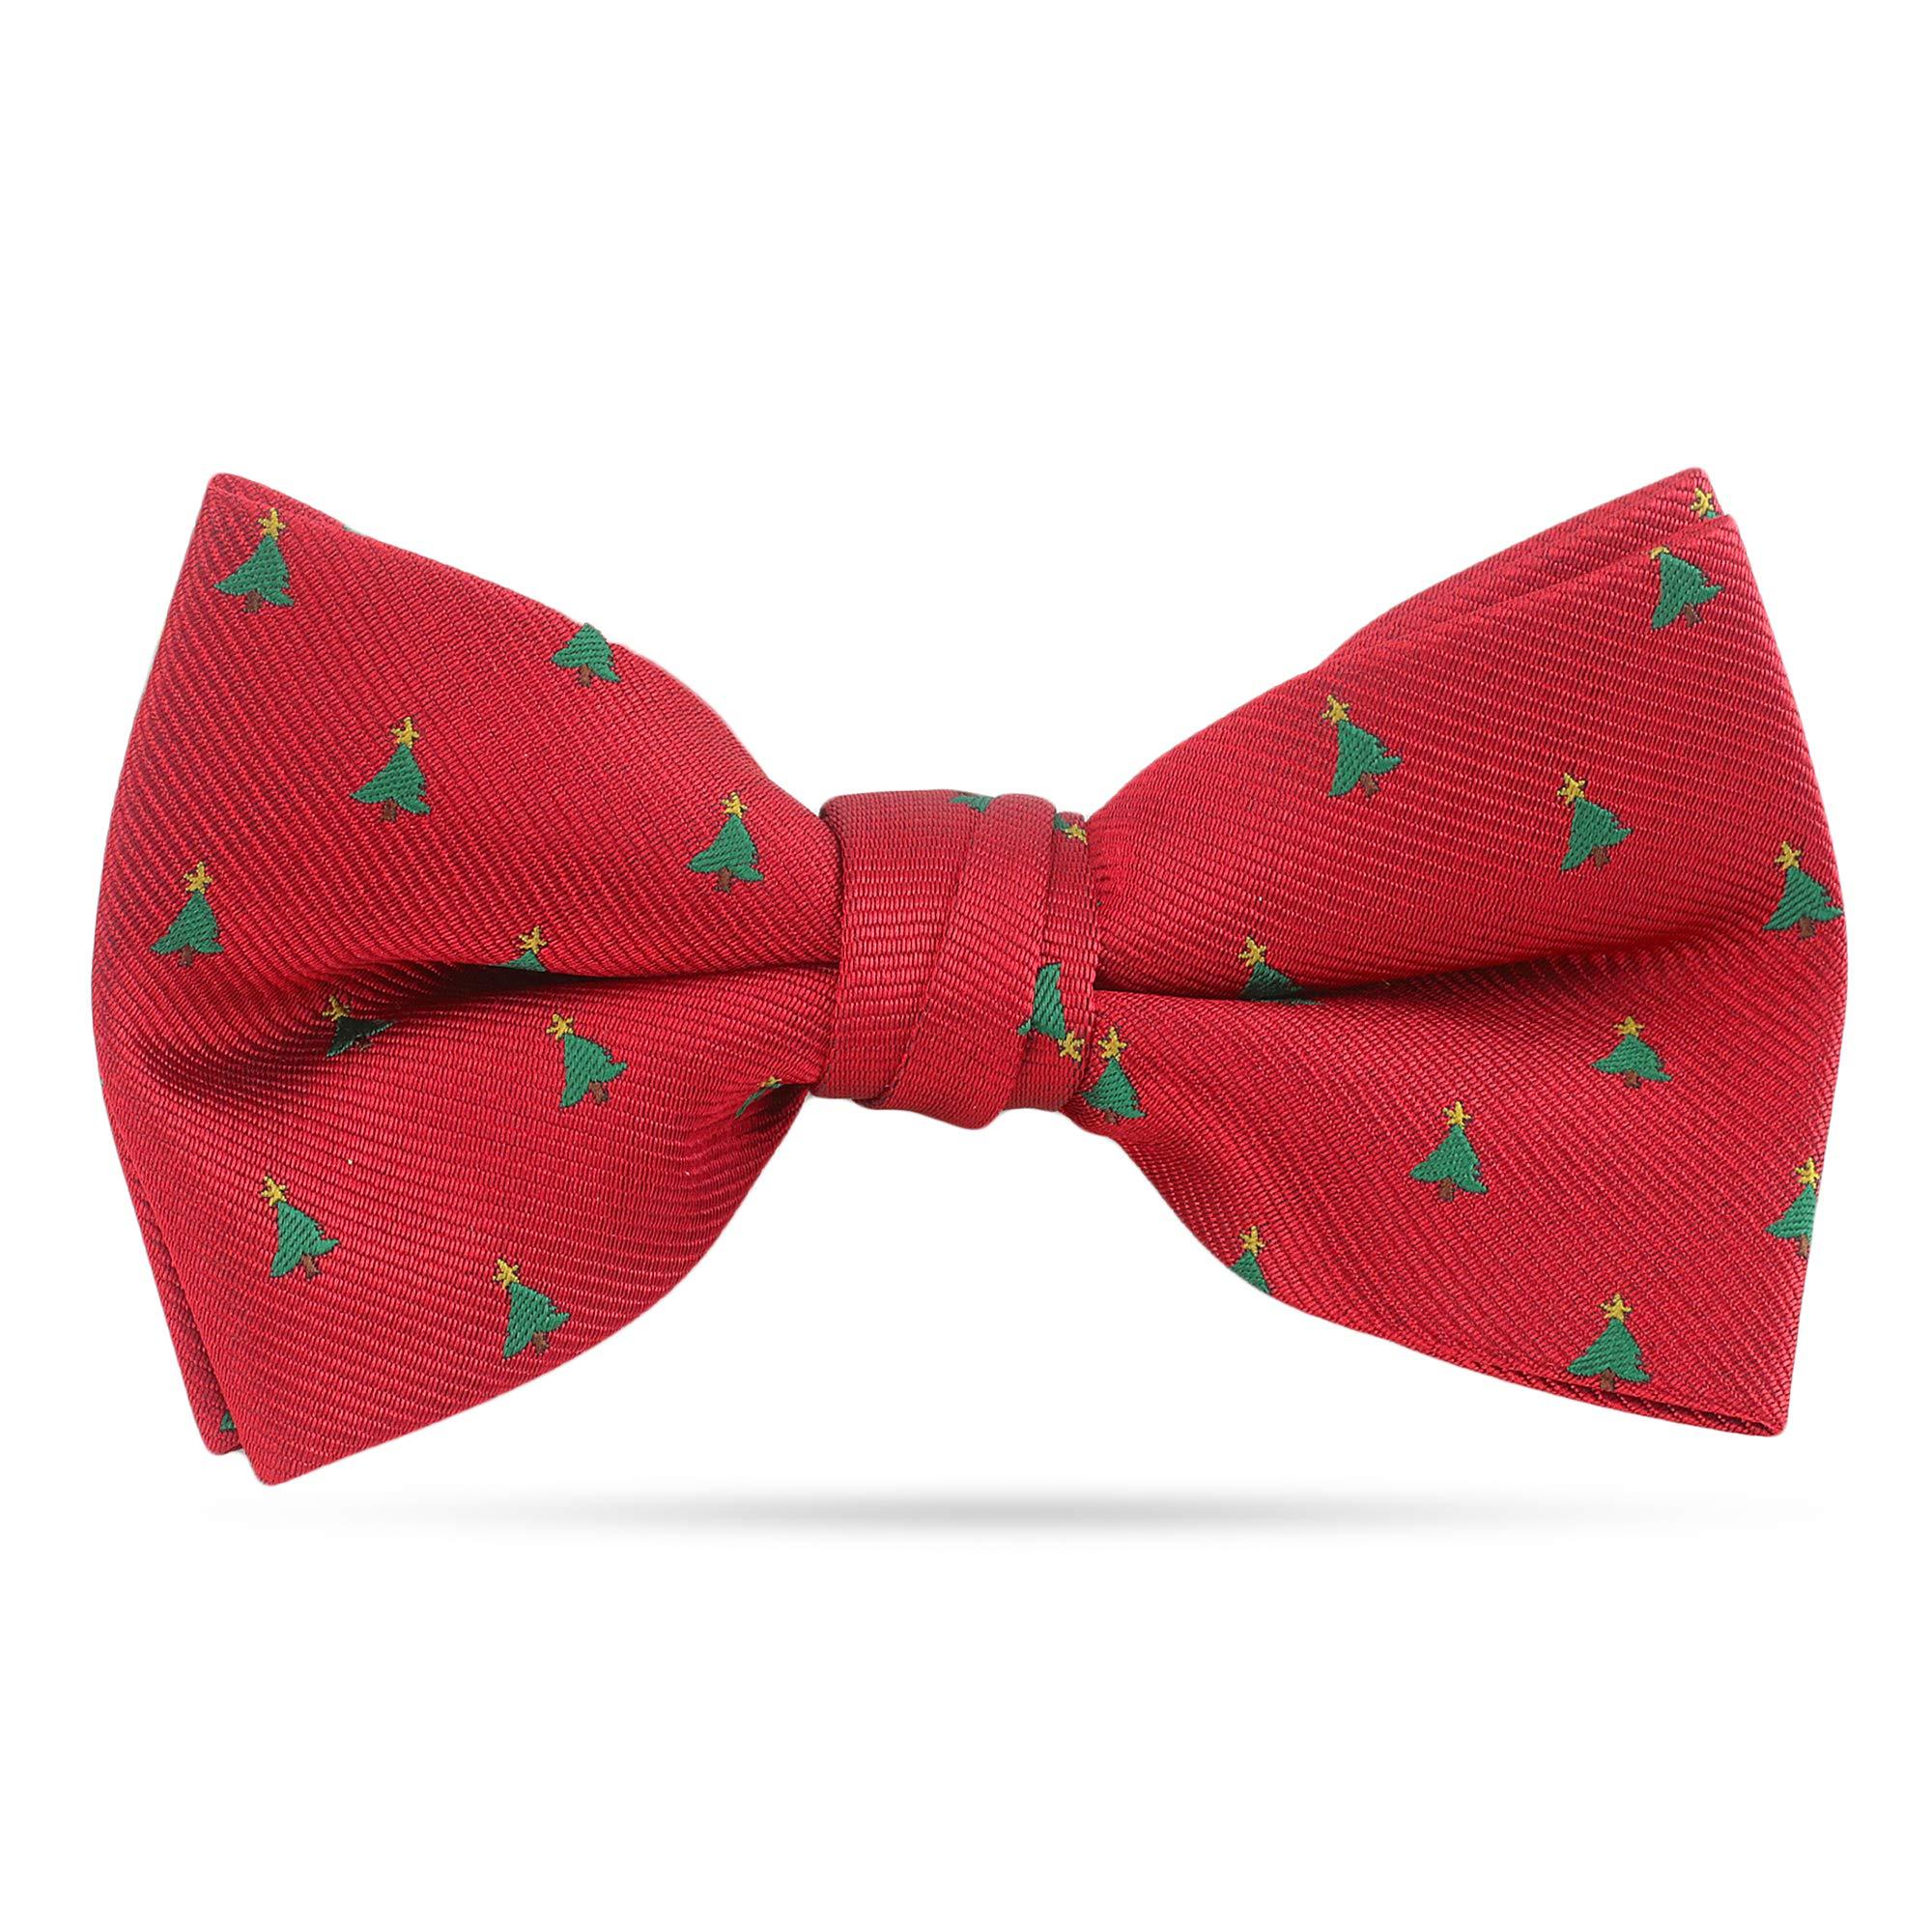 Man Ascot Tie 100/% Italian Silk Tessago Collection Made in Italy